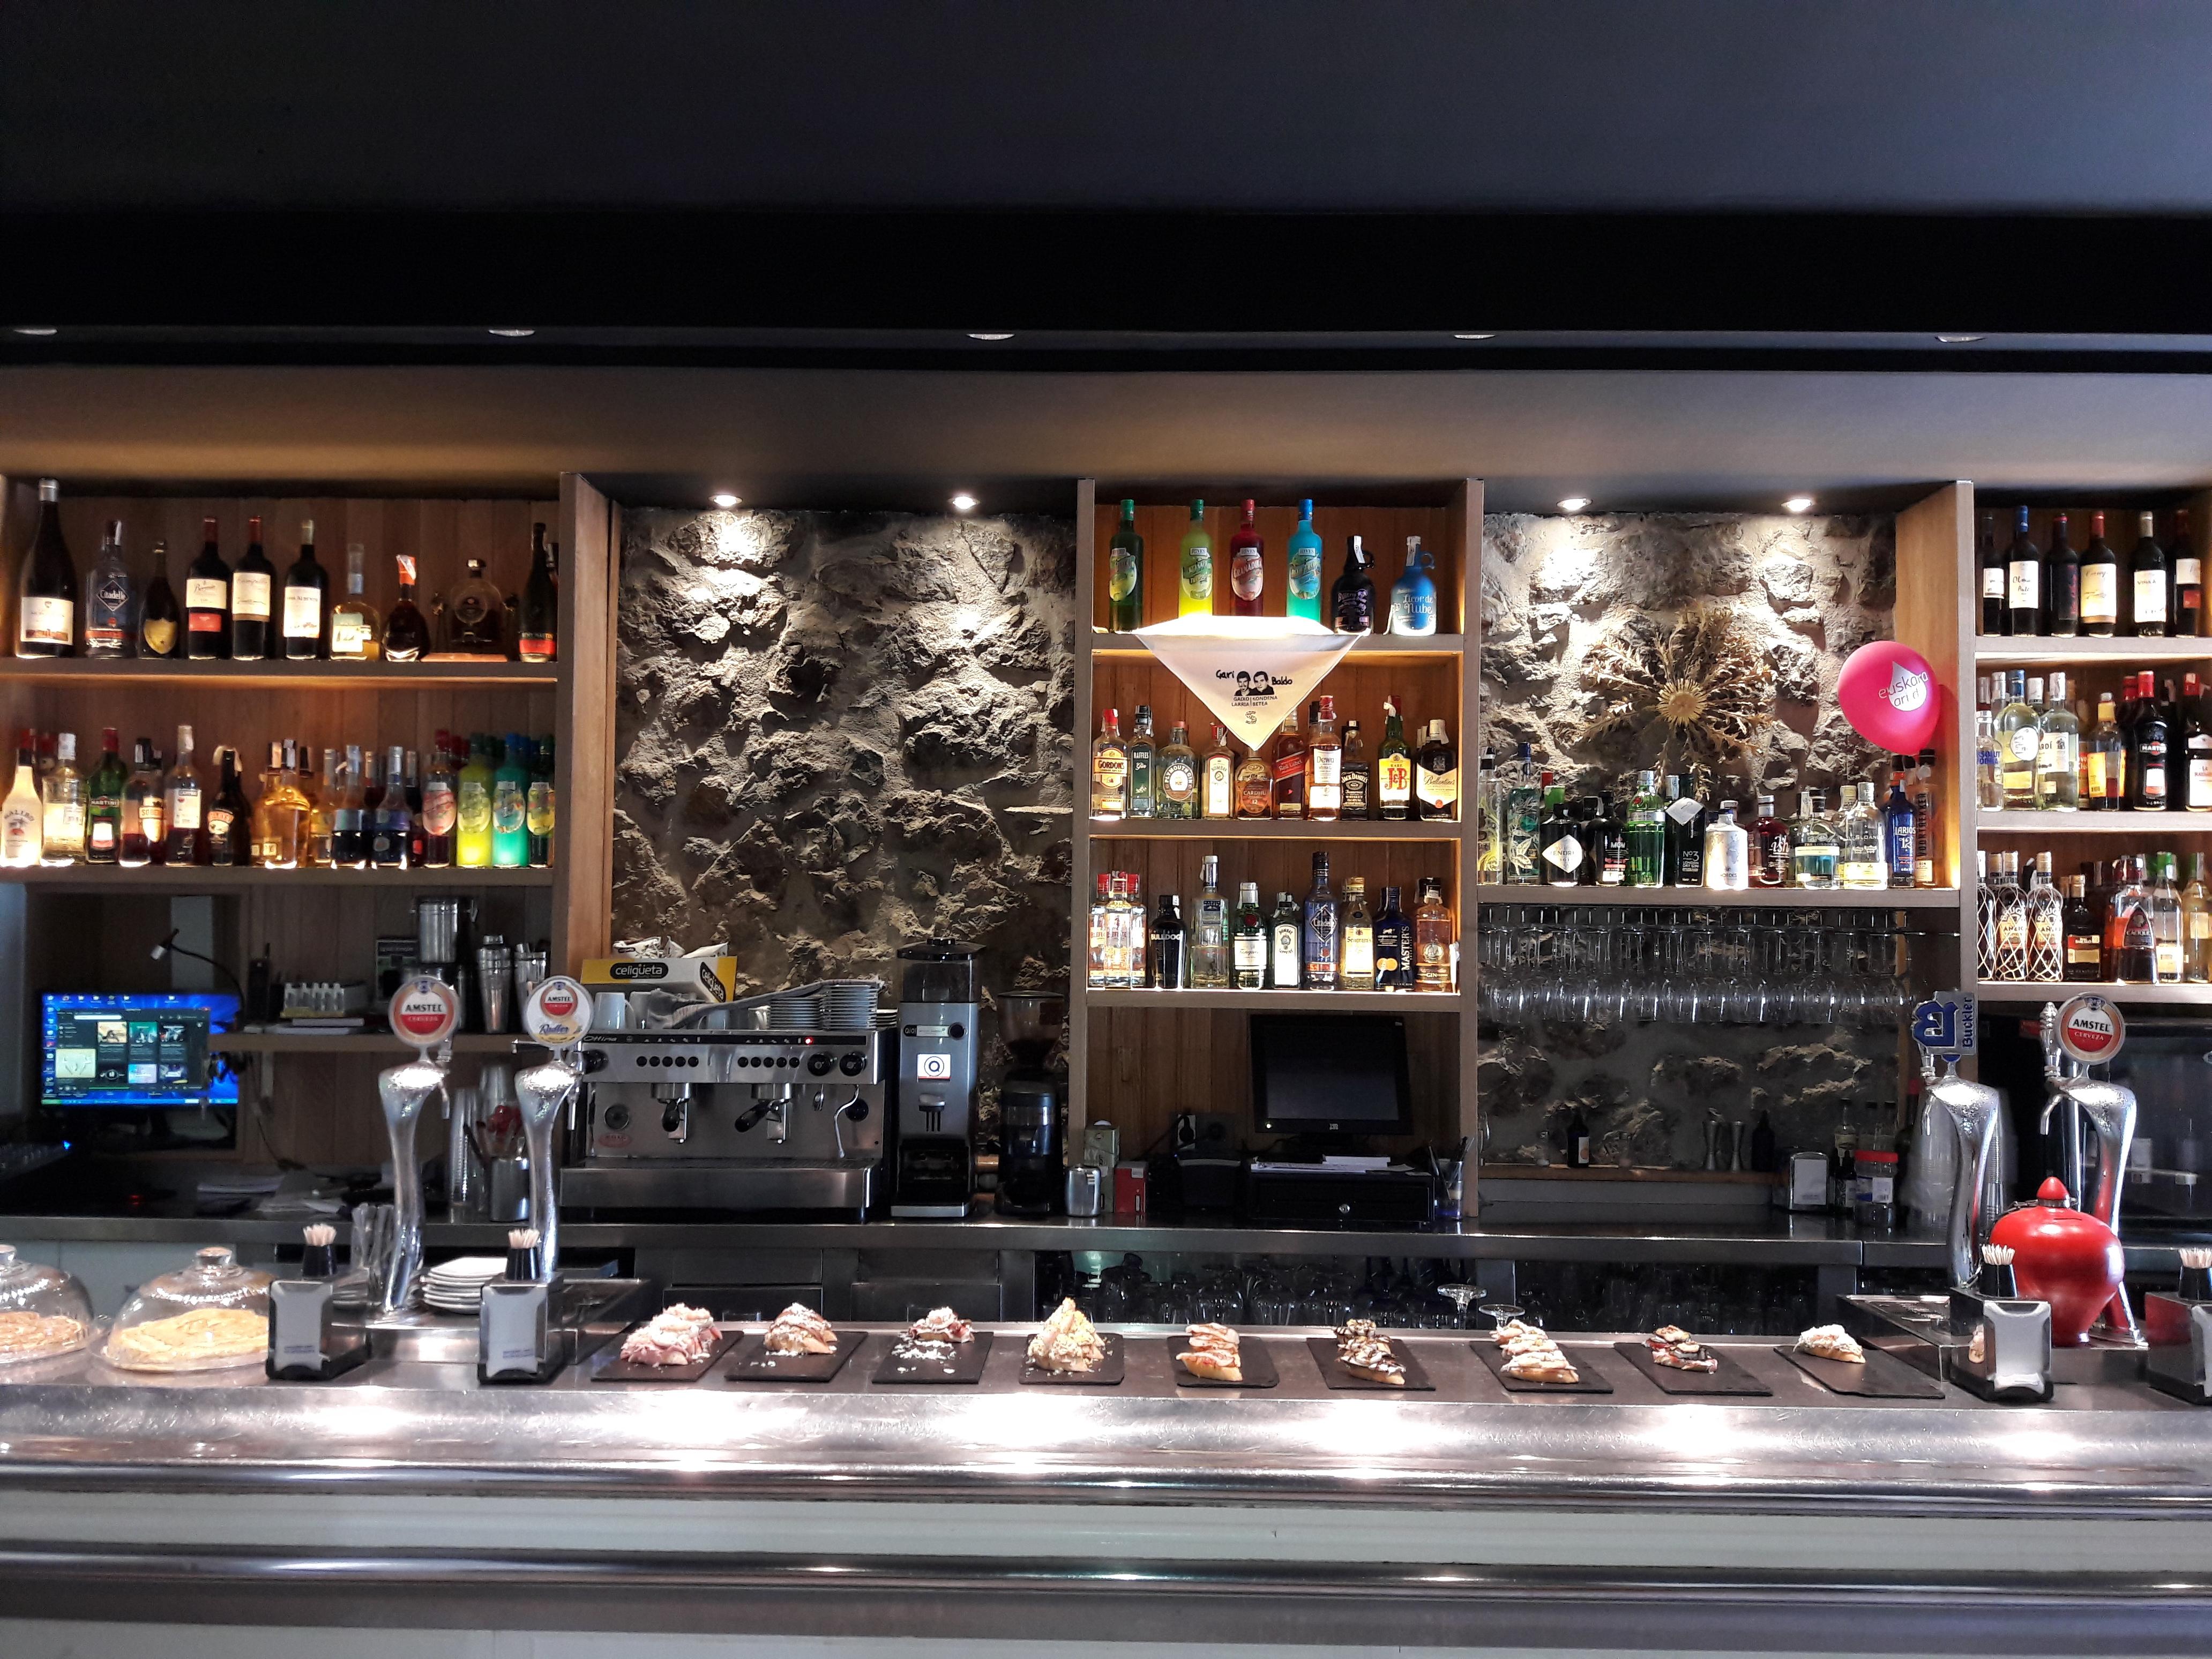 Botelleros para bar egur lanak - Botelleros para bar ...